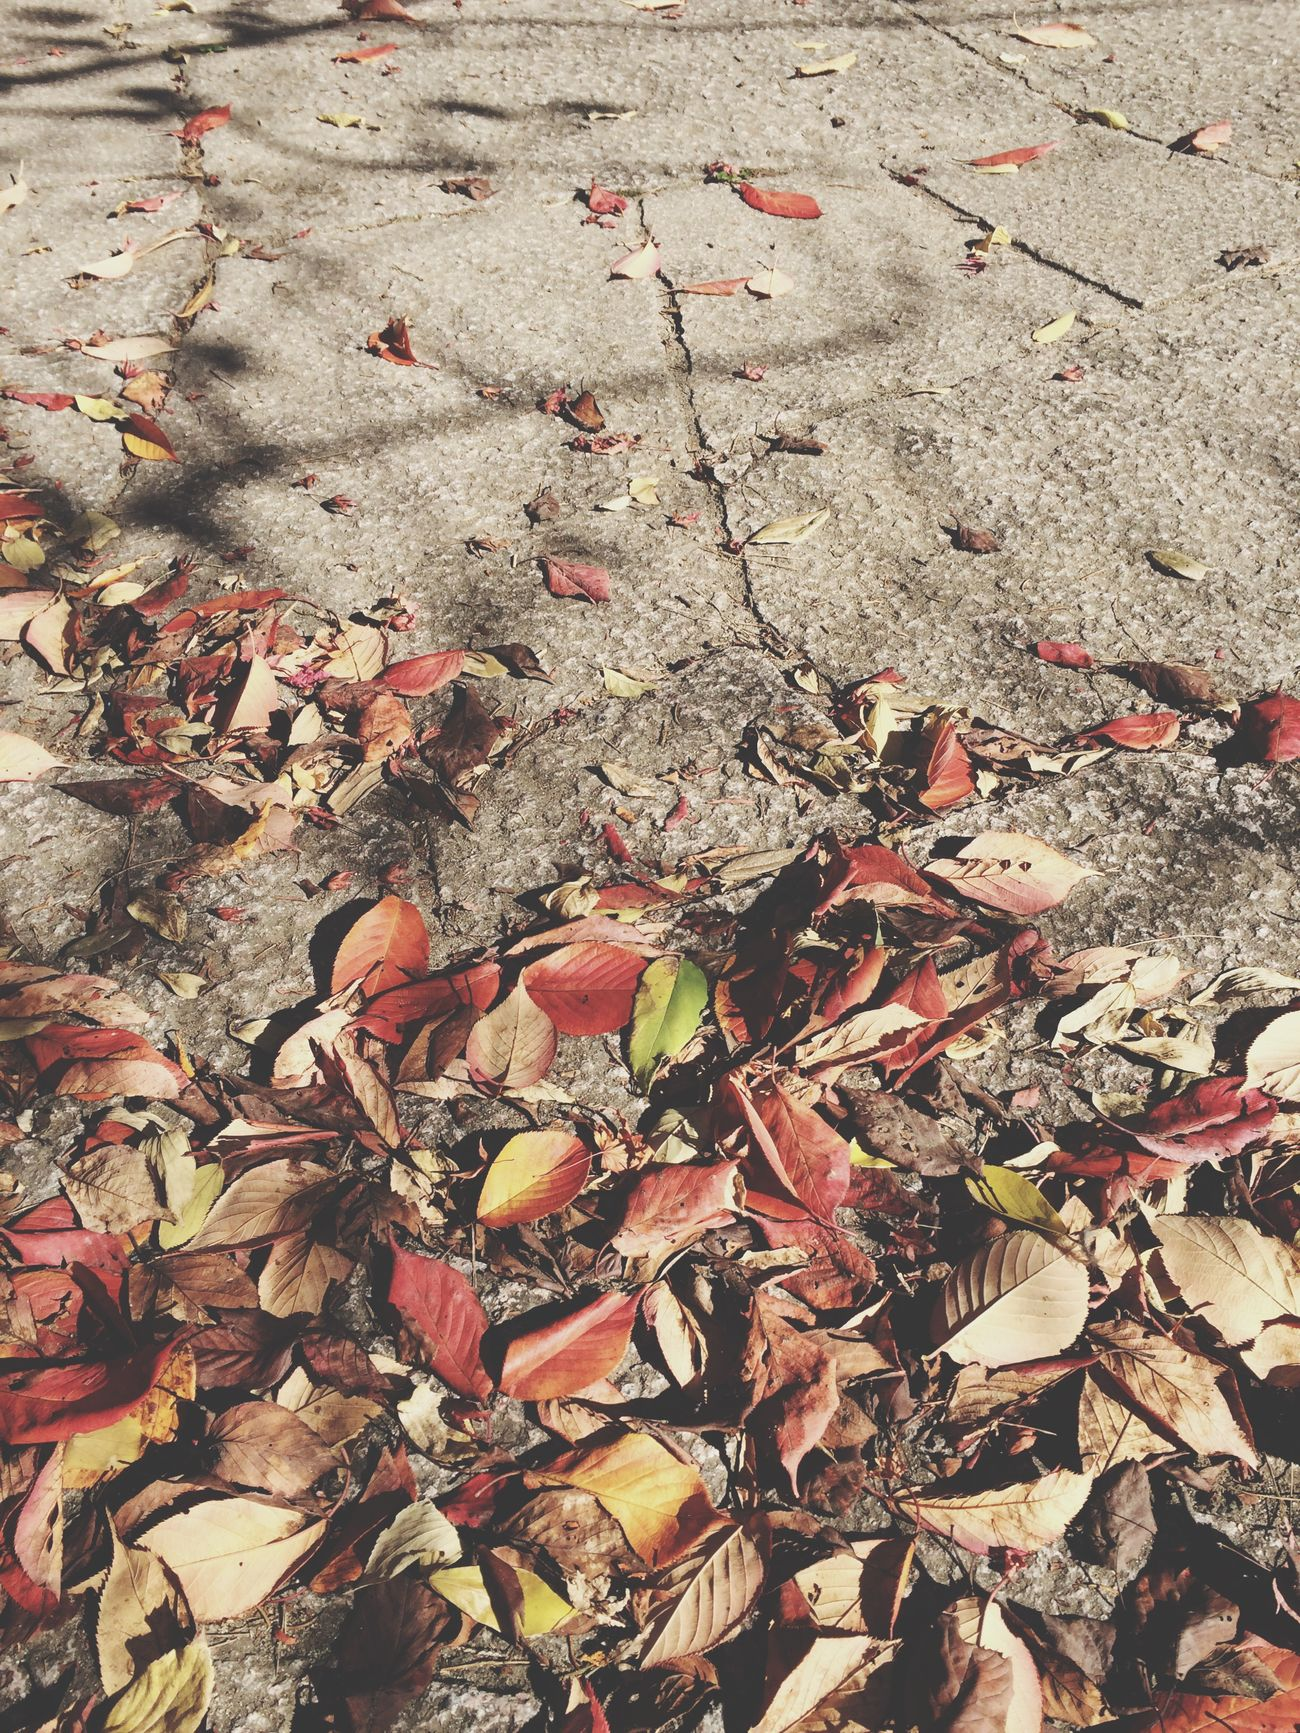 Autumn Leaves Fallen Leaves